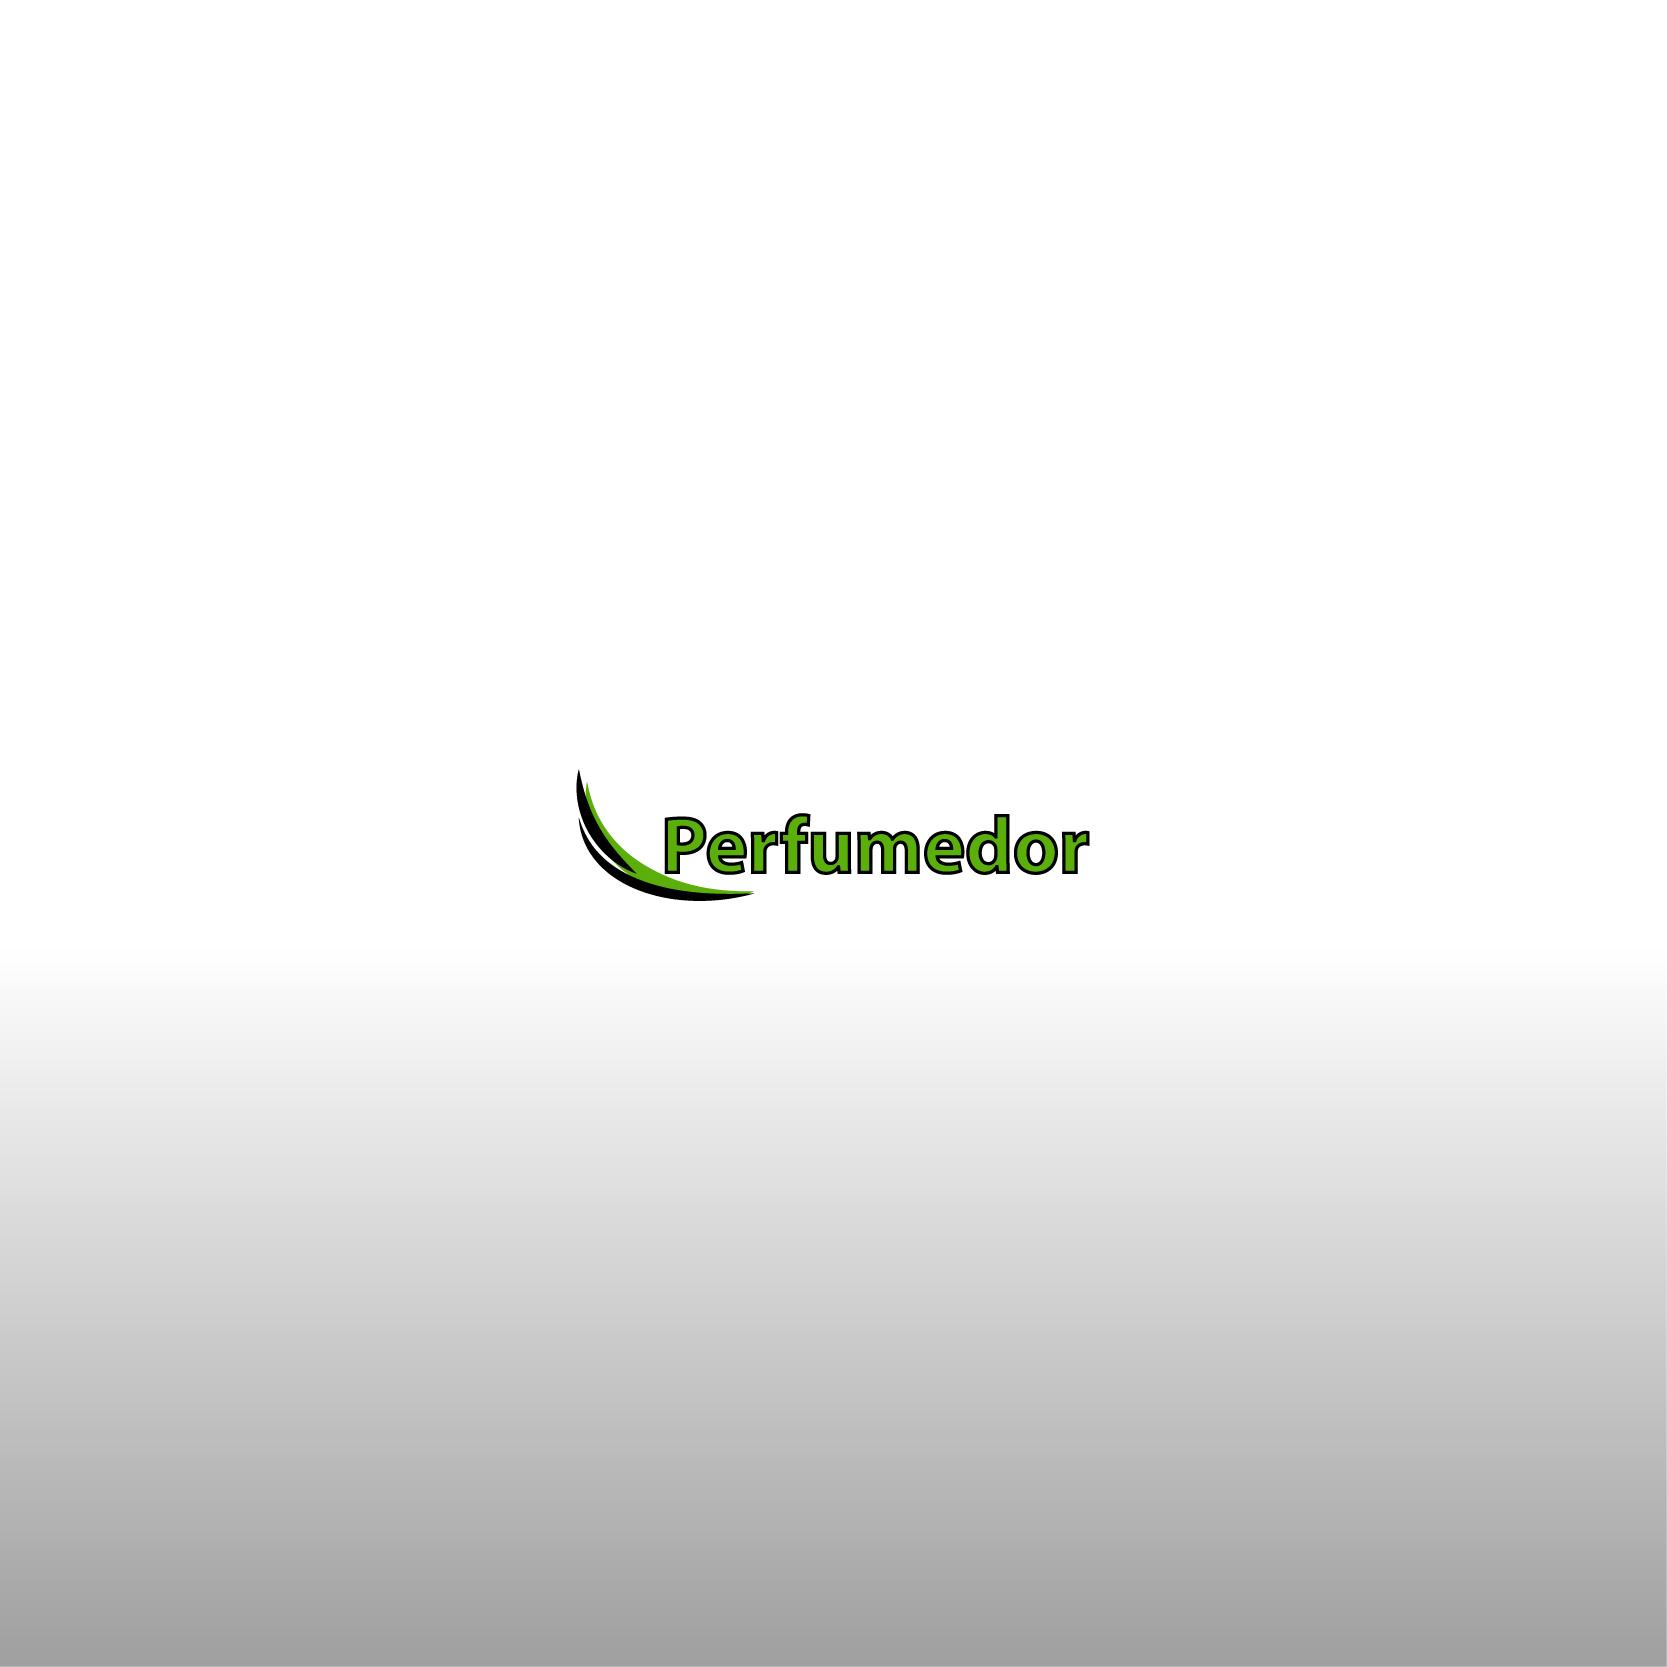 Логотип для интернет-магазина парфюмерии фото f_1655b459e34809c8.jpg